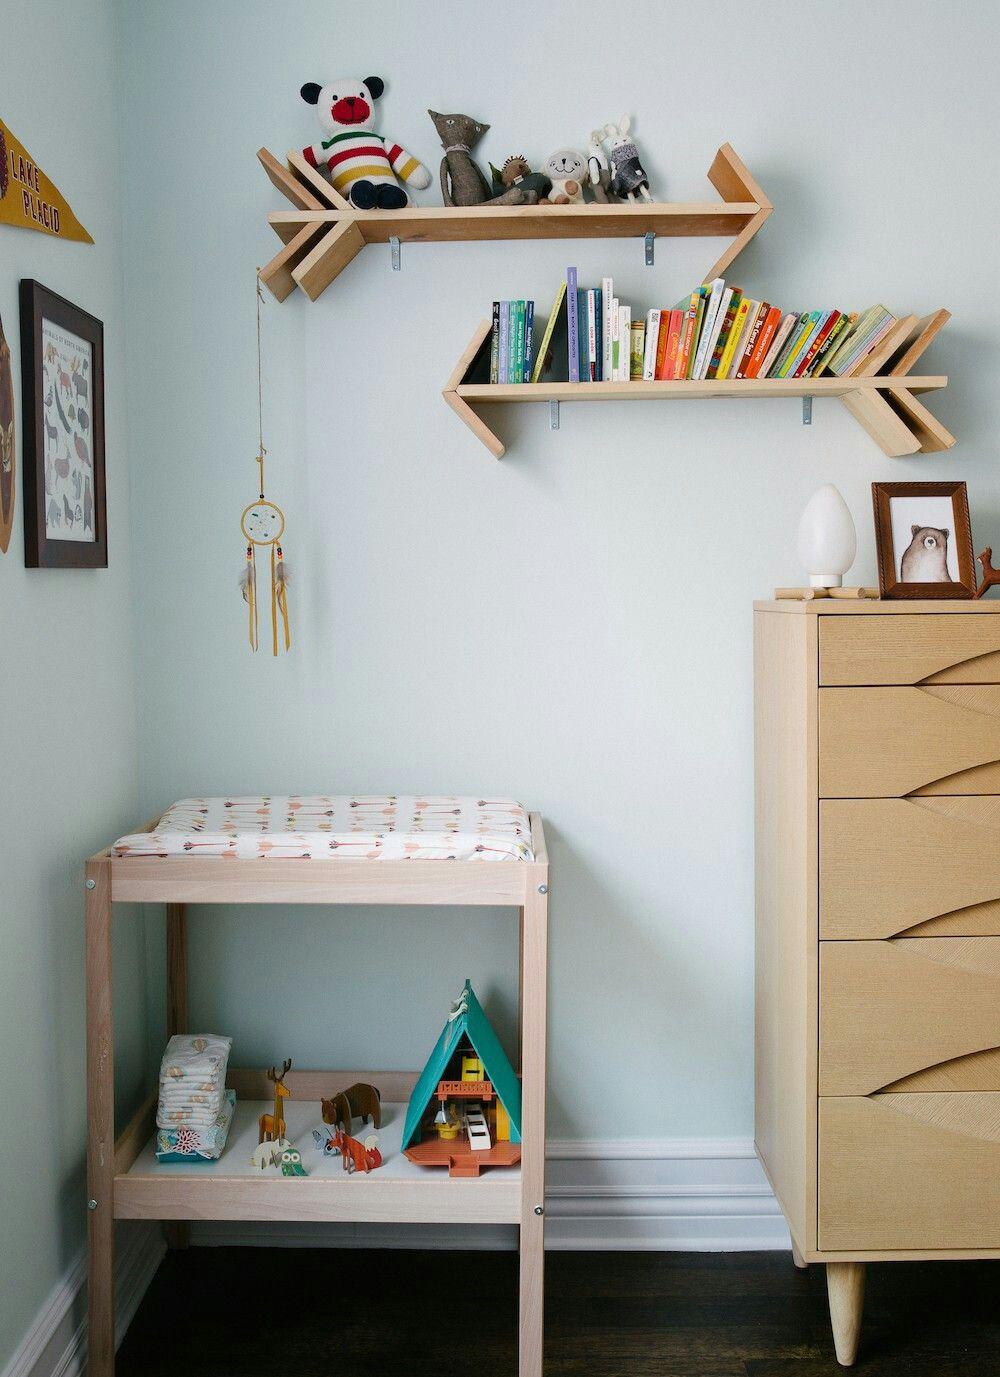 Arrow Shelves Baby Room Shelves Kids Wall Shelves Nursery Bookshelf